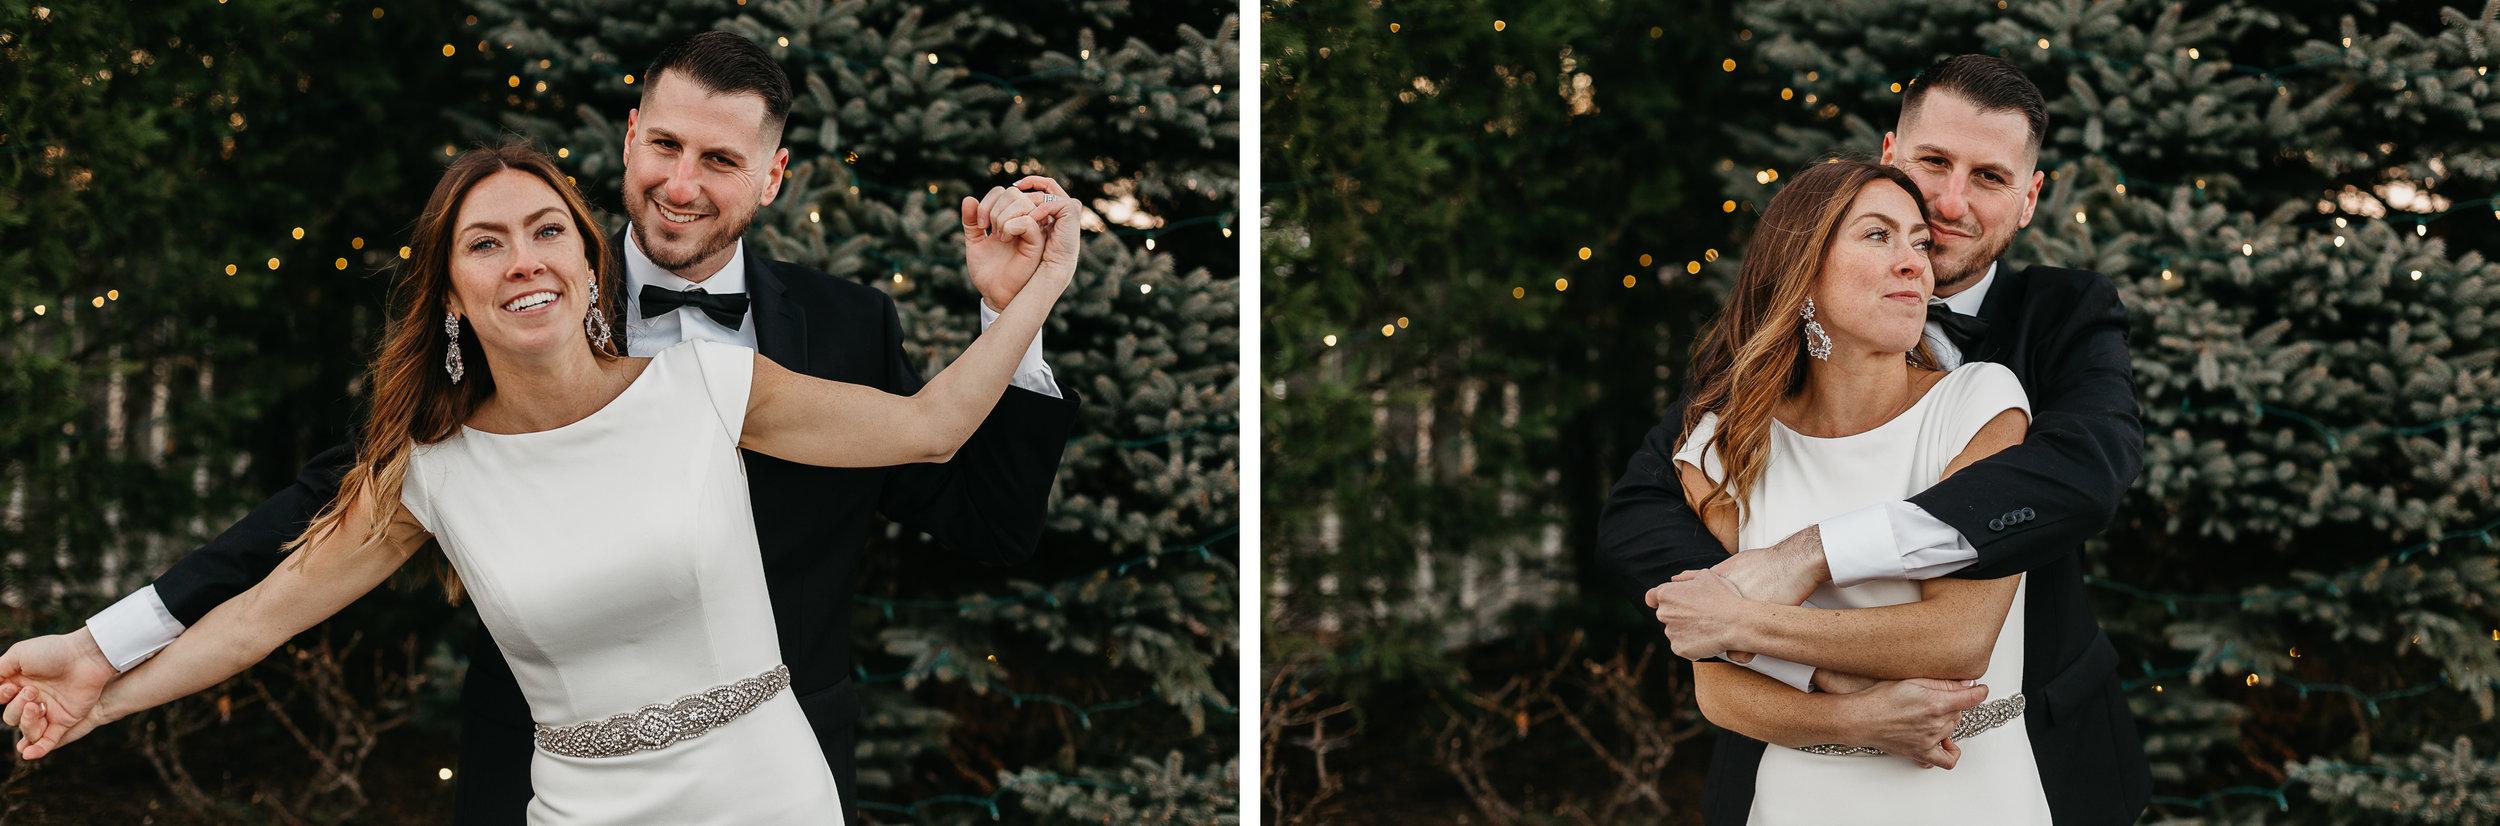 austin wedding photographer-7.jpg